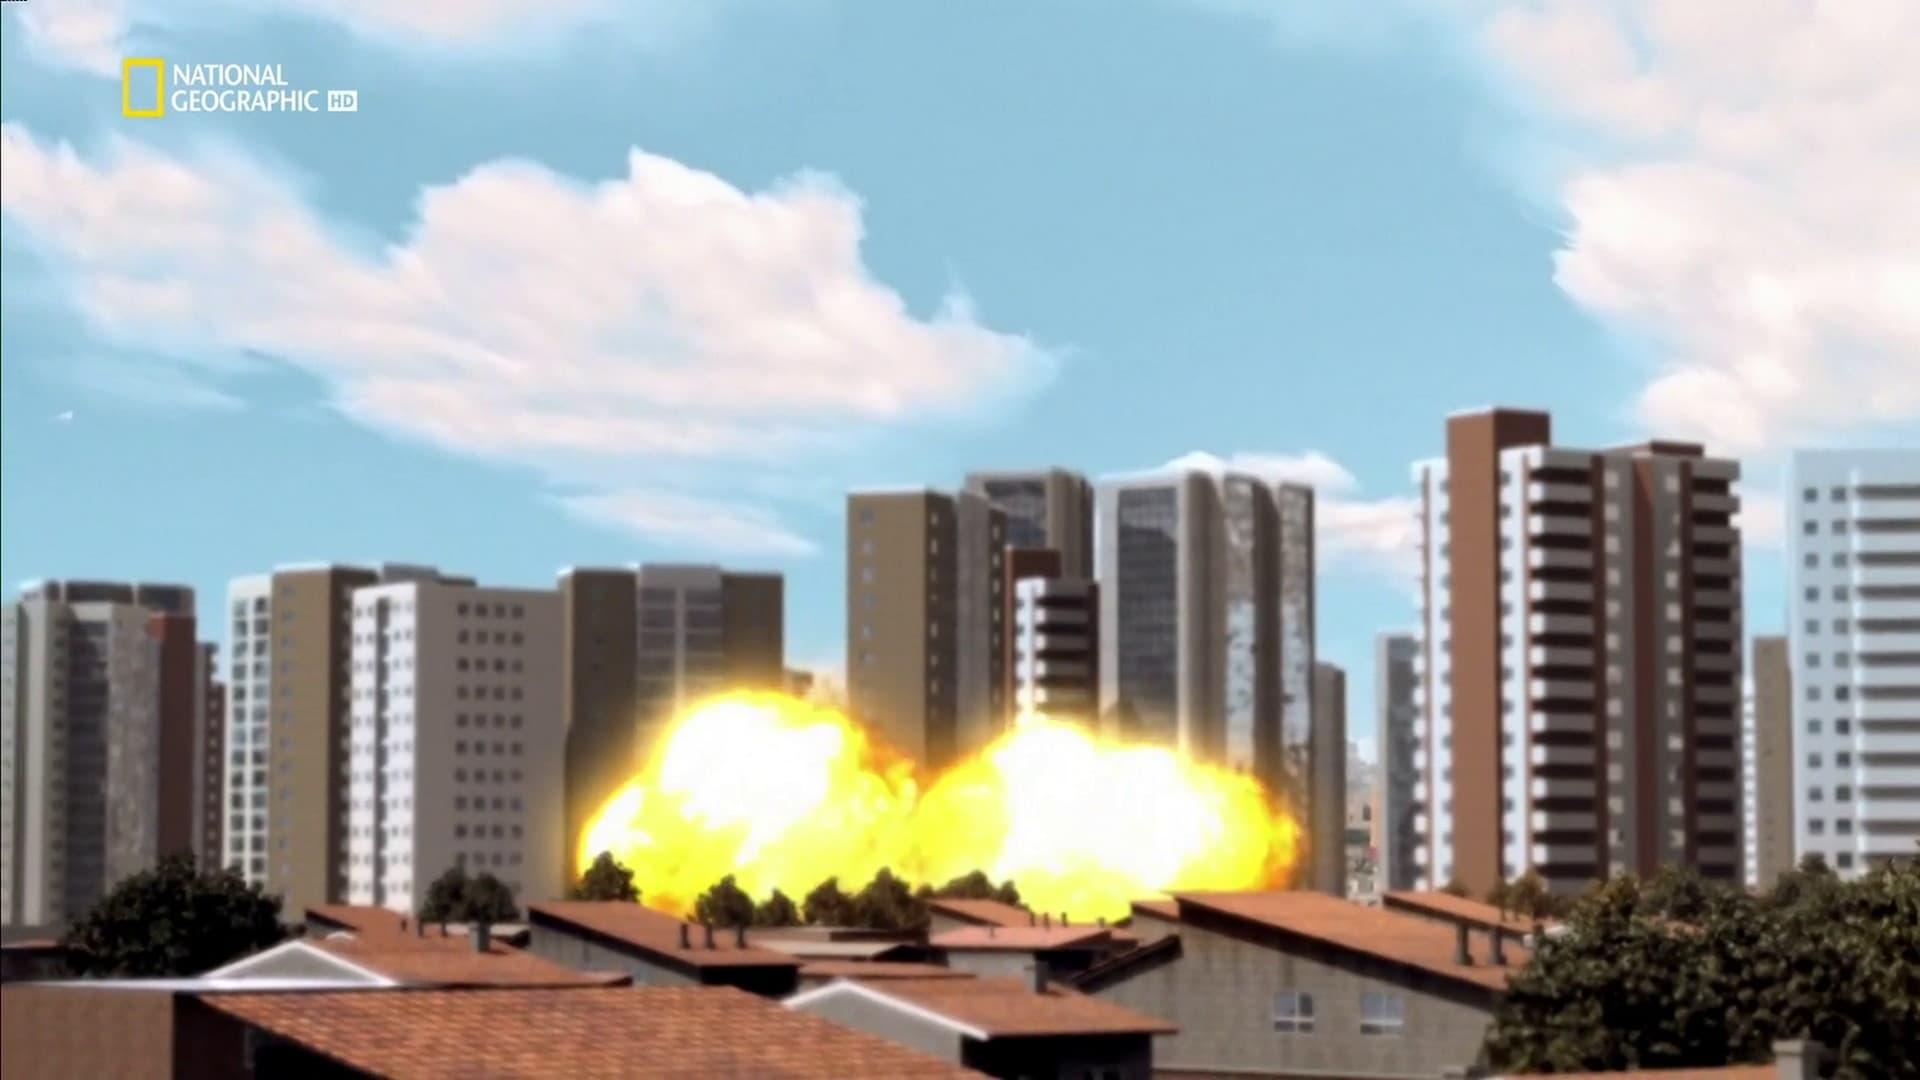 Mayday Season 15 :Episode 7  Carnage in Sao Paulo (TAM Transportes Aéreos Regionais Flight 402)